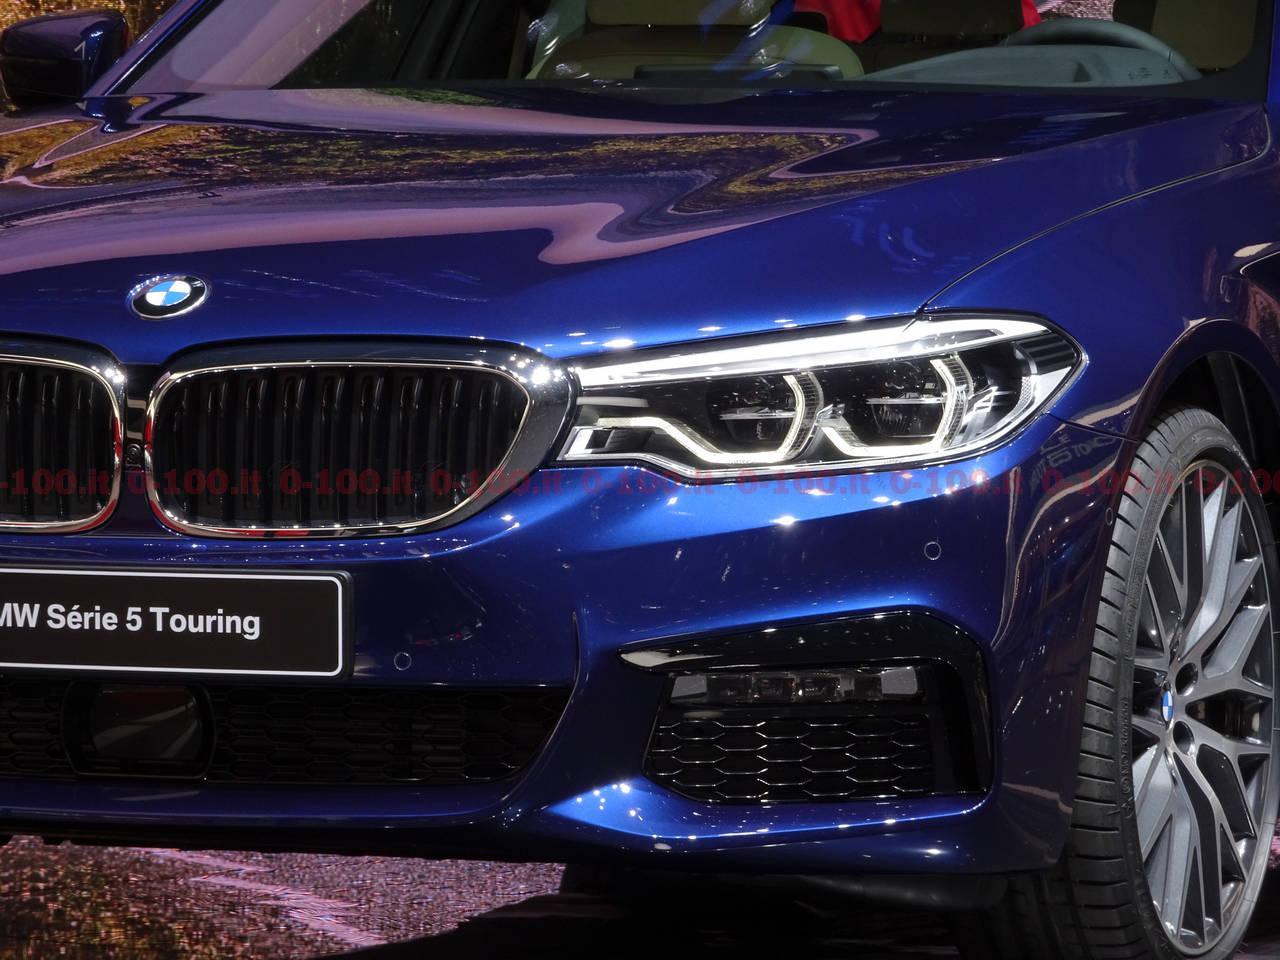 Ginevra-geneva-geneve-2017-BMW_Serie-5-Touring_0-100_7